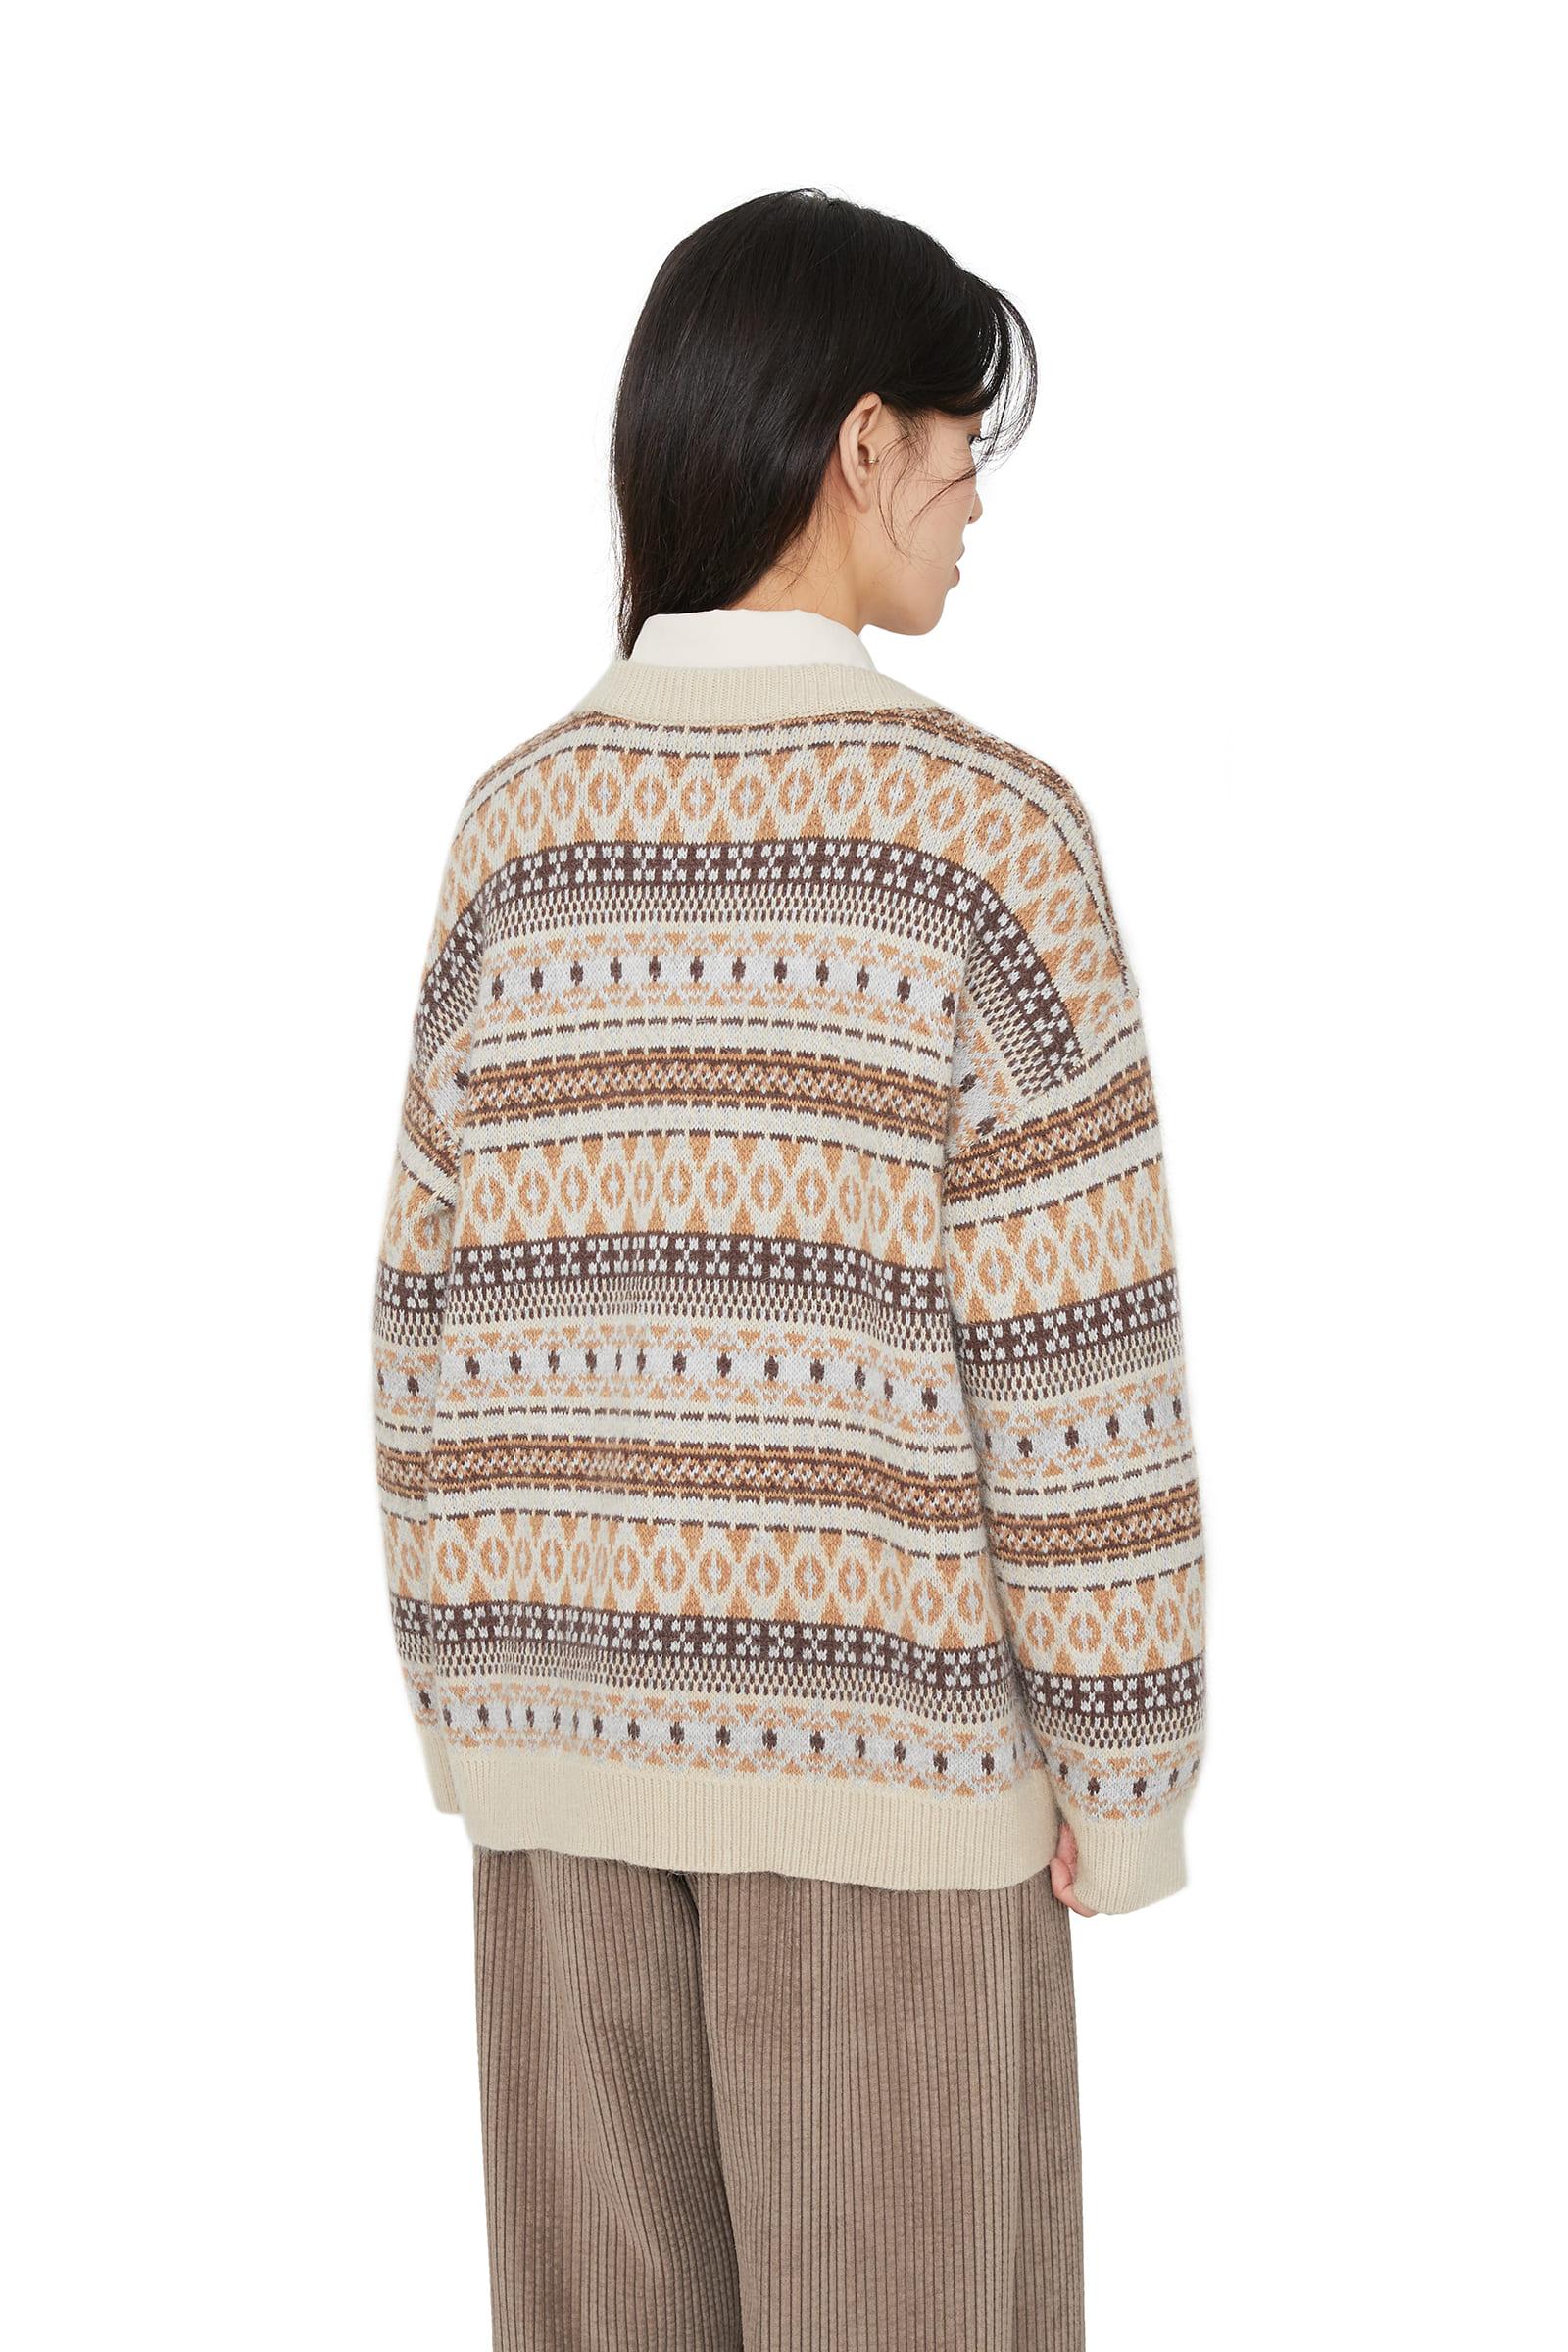 Biller Pattern Angora Crew Neck Knit